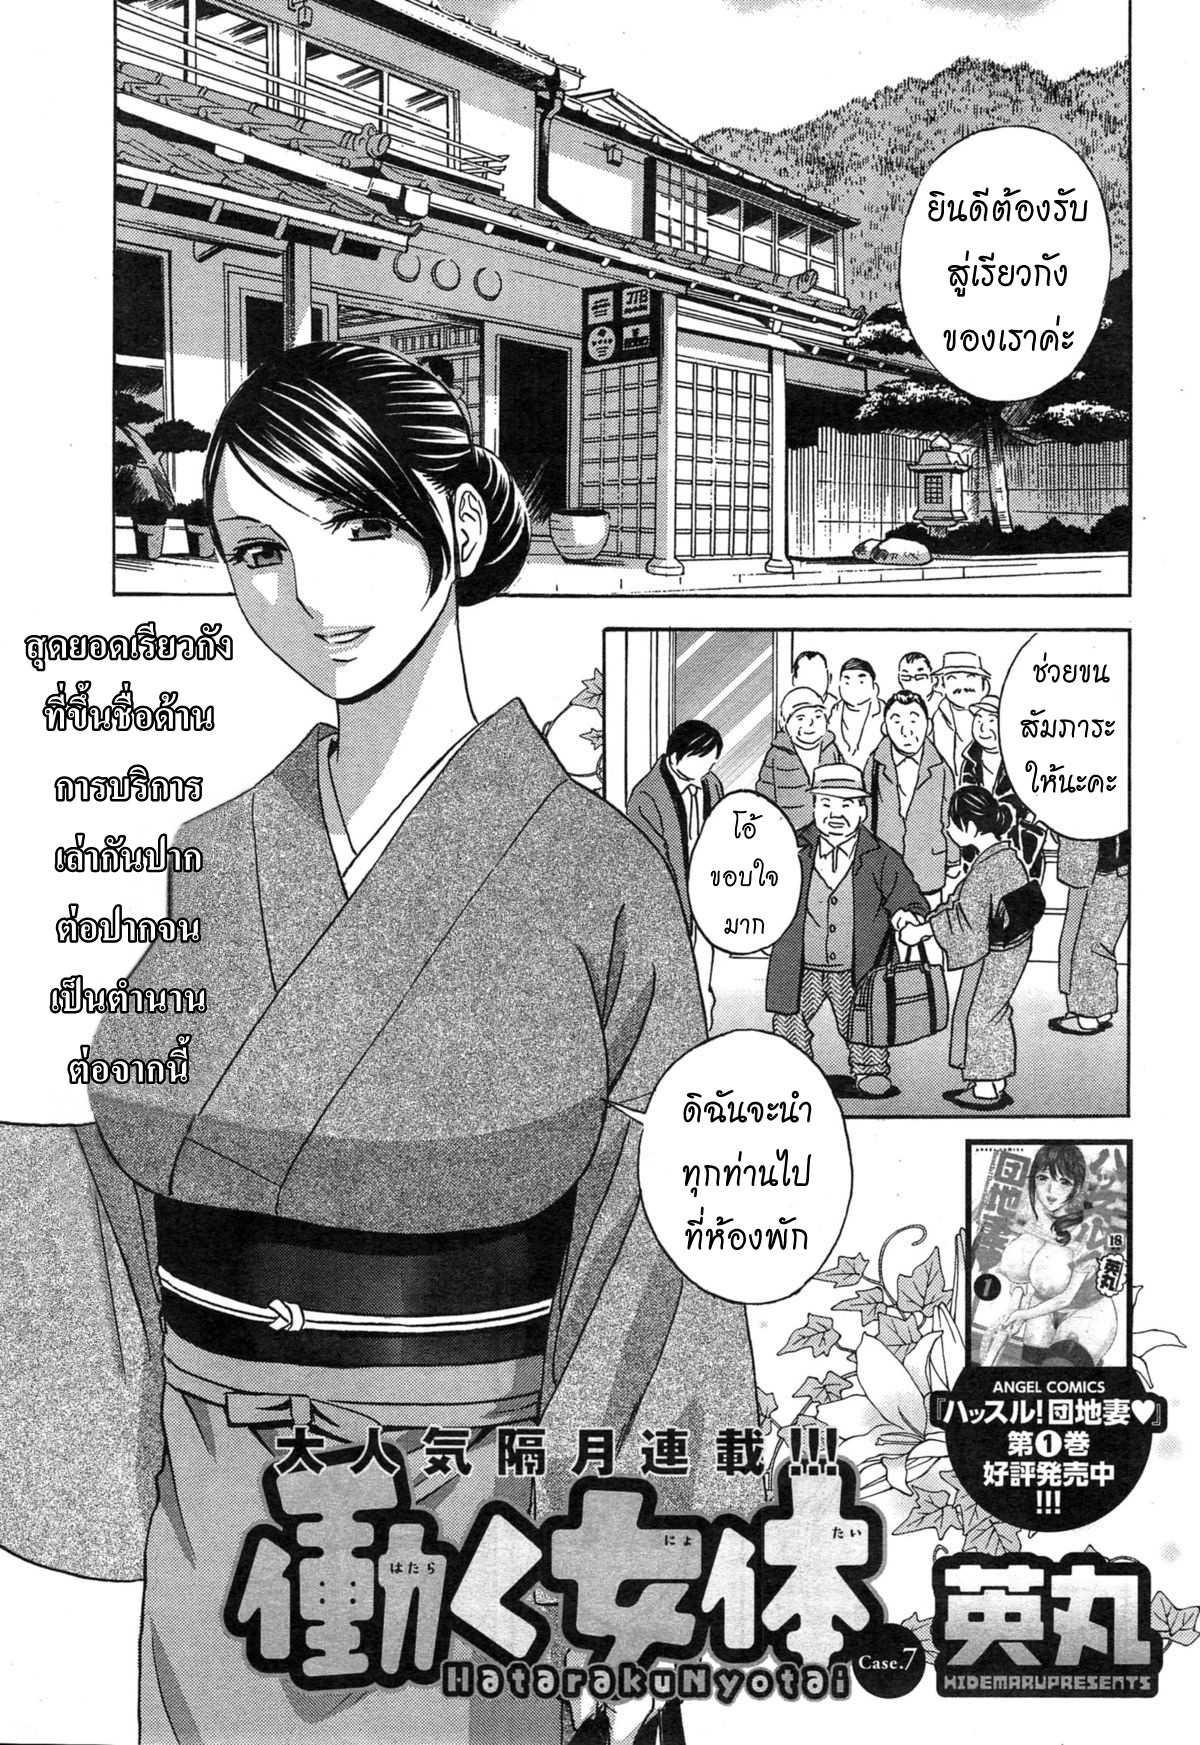 hidemaru-hataraku-nyotai-ch2